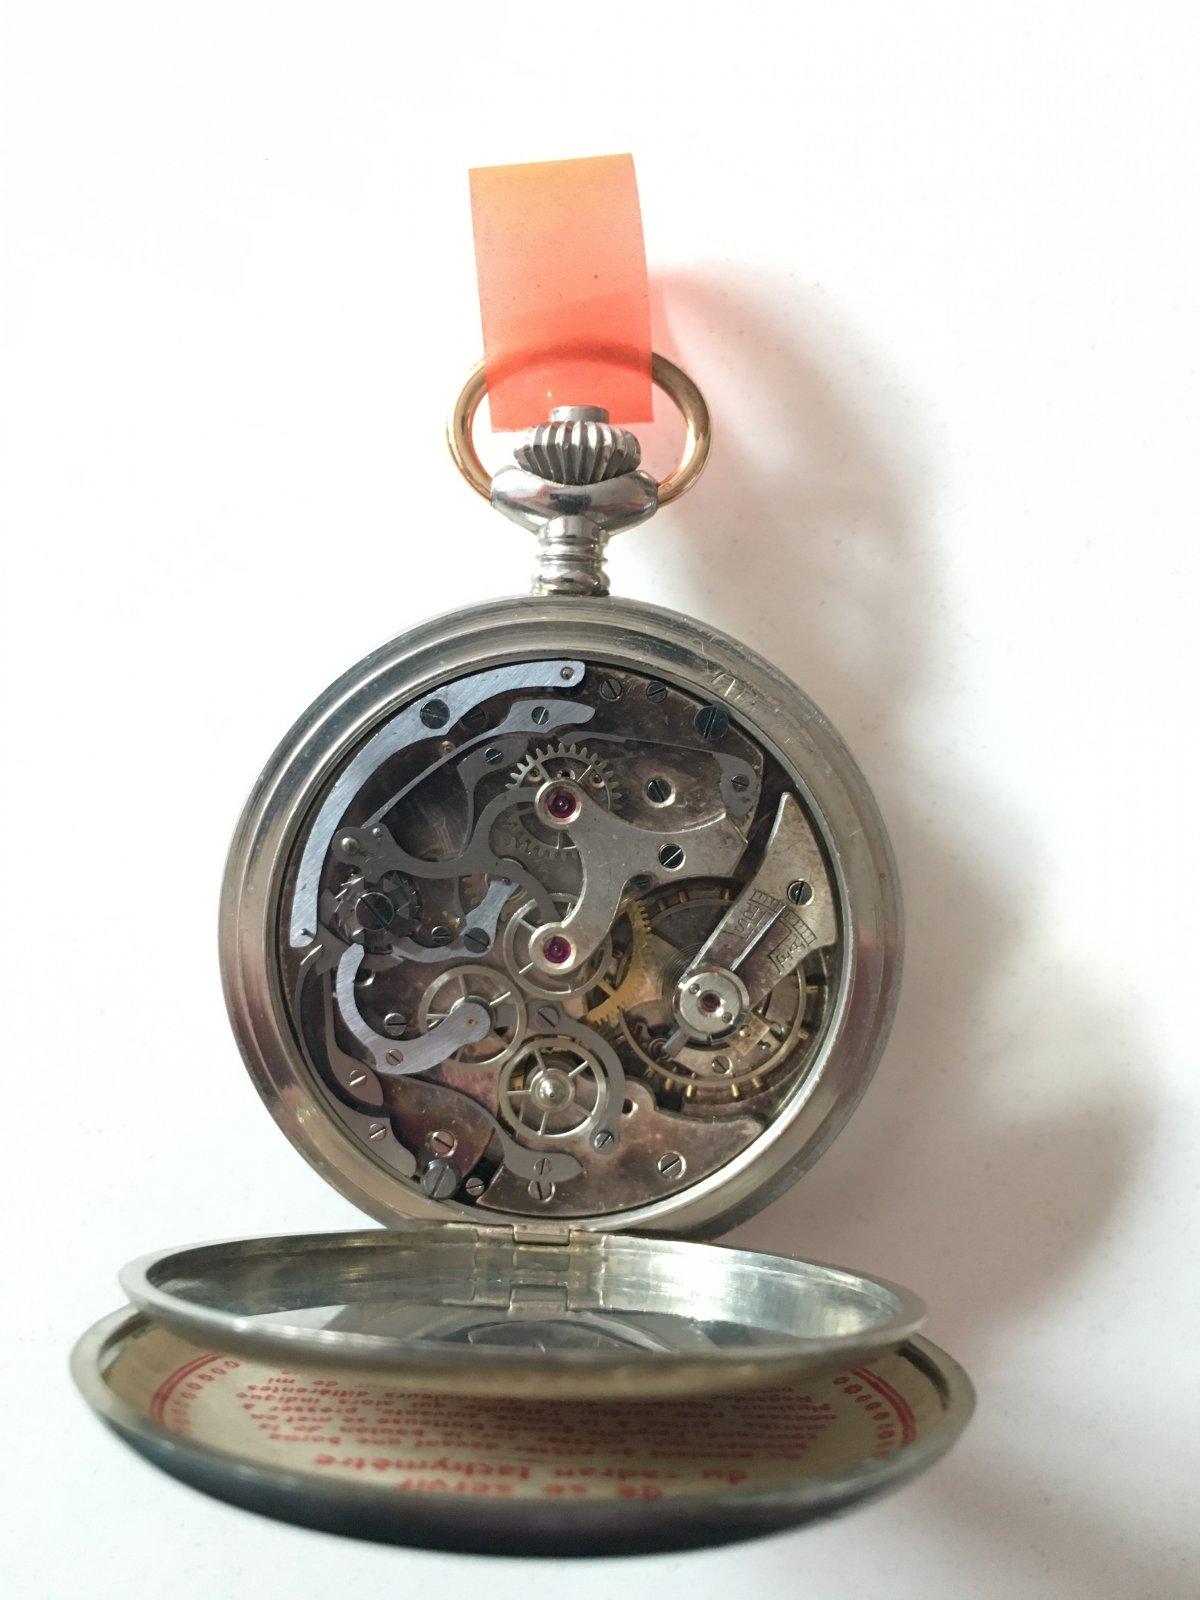 chrono_02.JPG